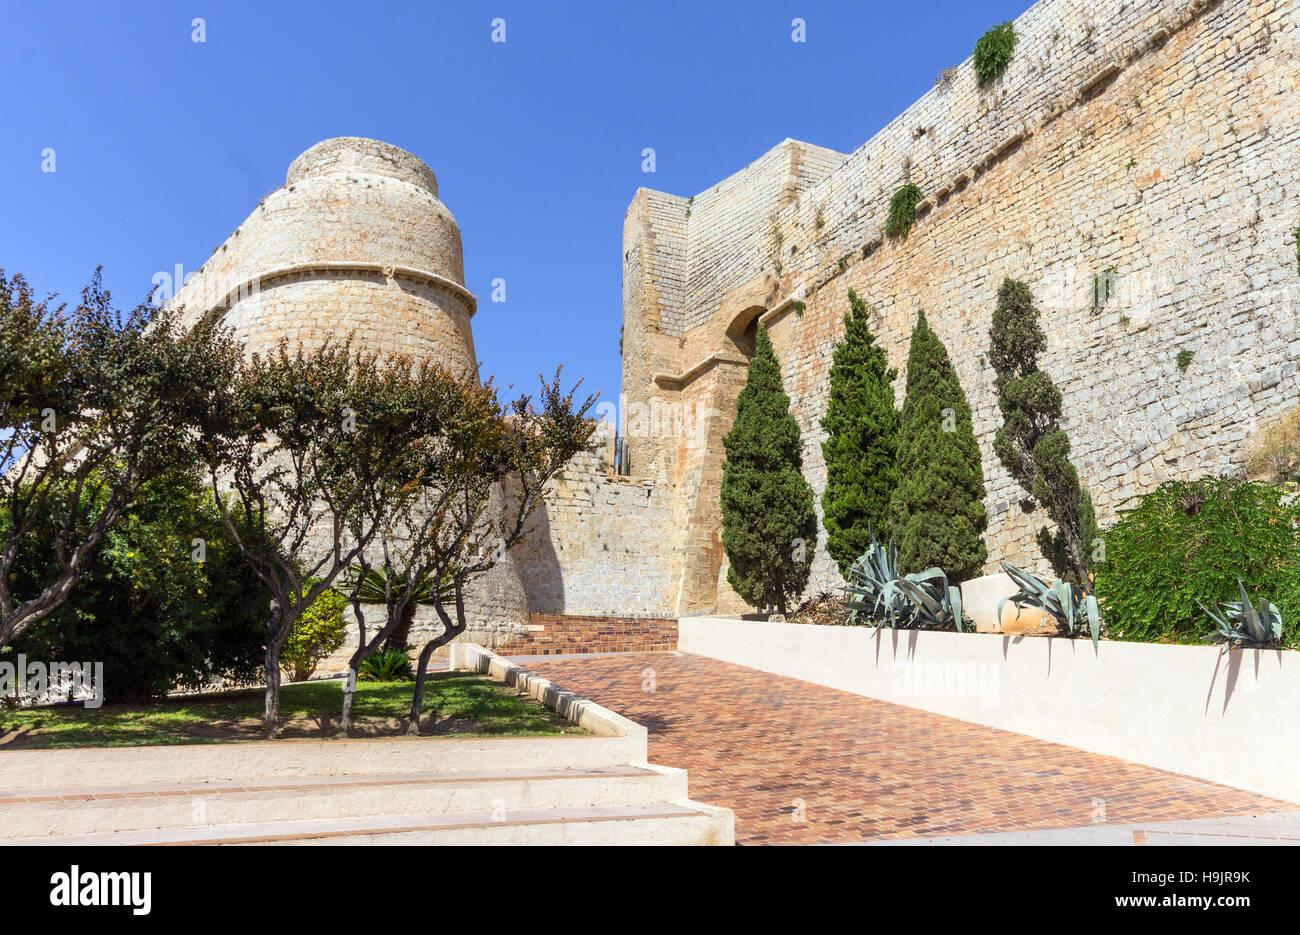 Spain, Balearic Islands, Ibiza, Eivissa, old town Dalt Vila, Portal Nou - Stock Image